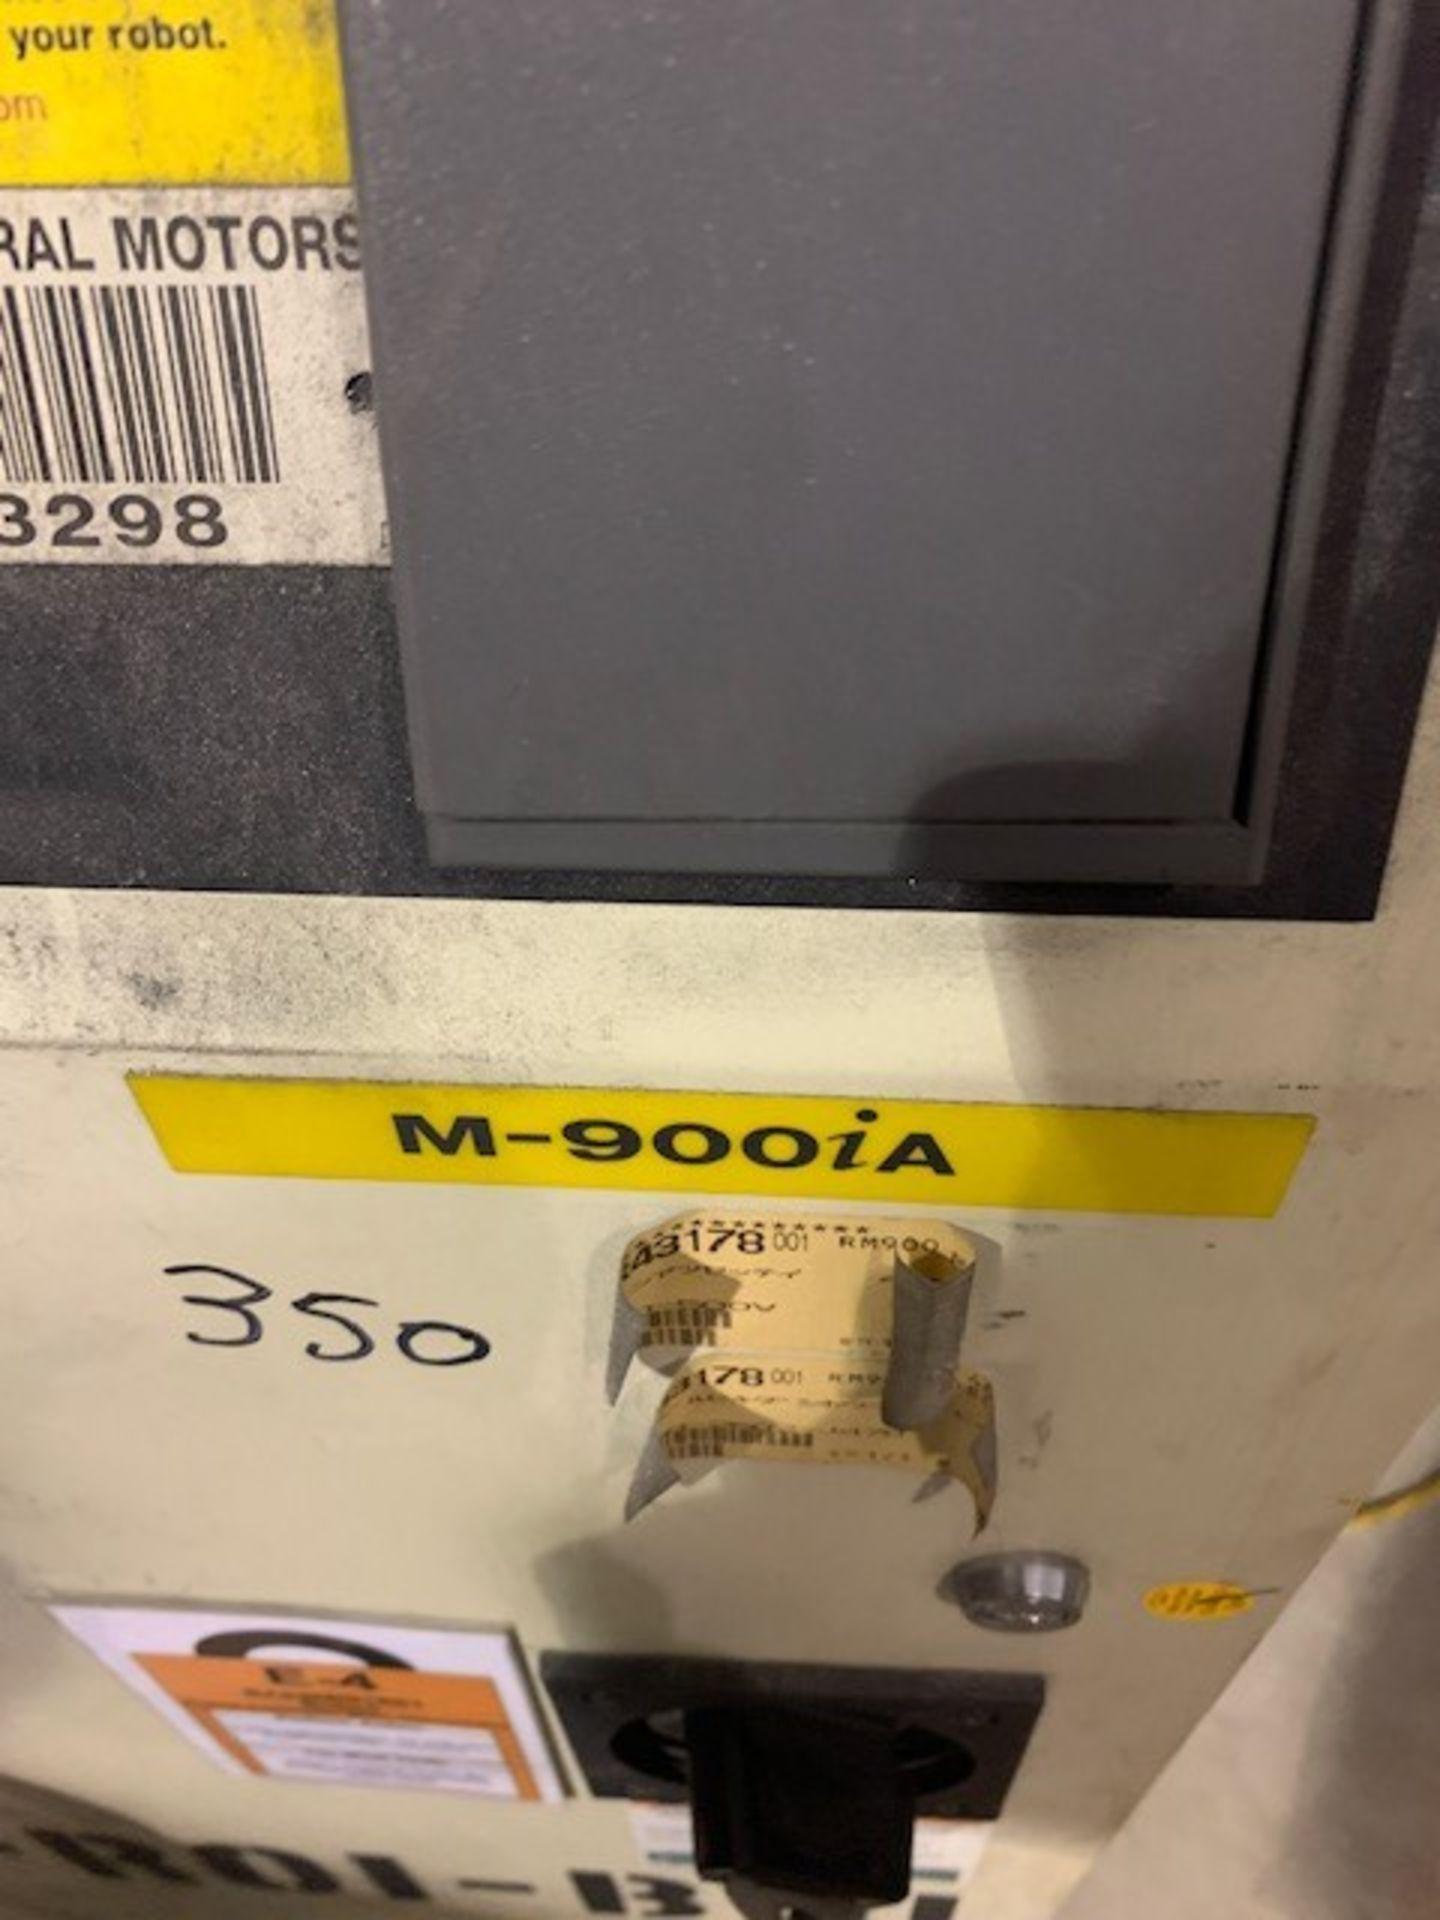 Lot 20 - FANUC ROBOT M900iA/350 WITH R-30iA CONTROL, TEACH & CABLES, YEAR 2011, SN 111639, ALUMINUM SPOT GUN